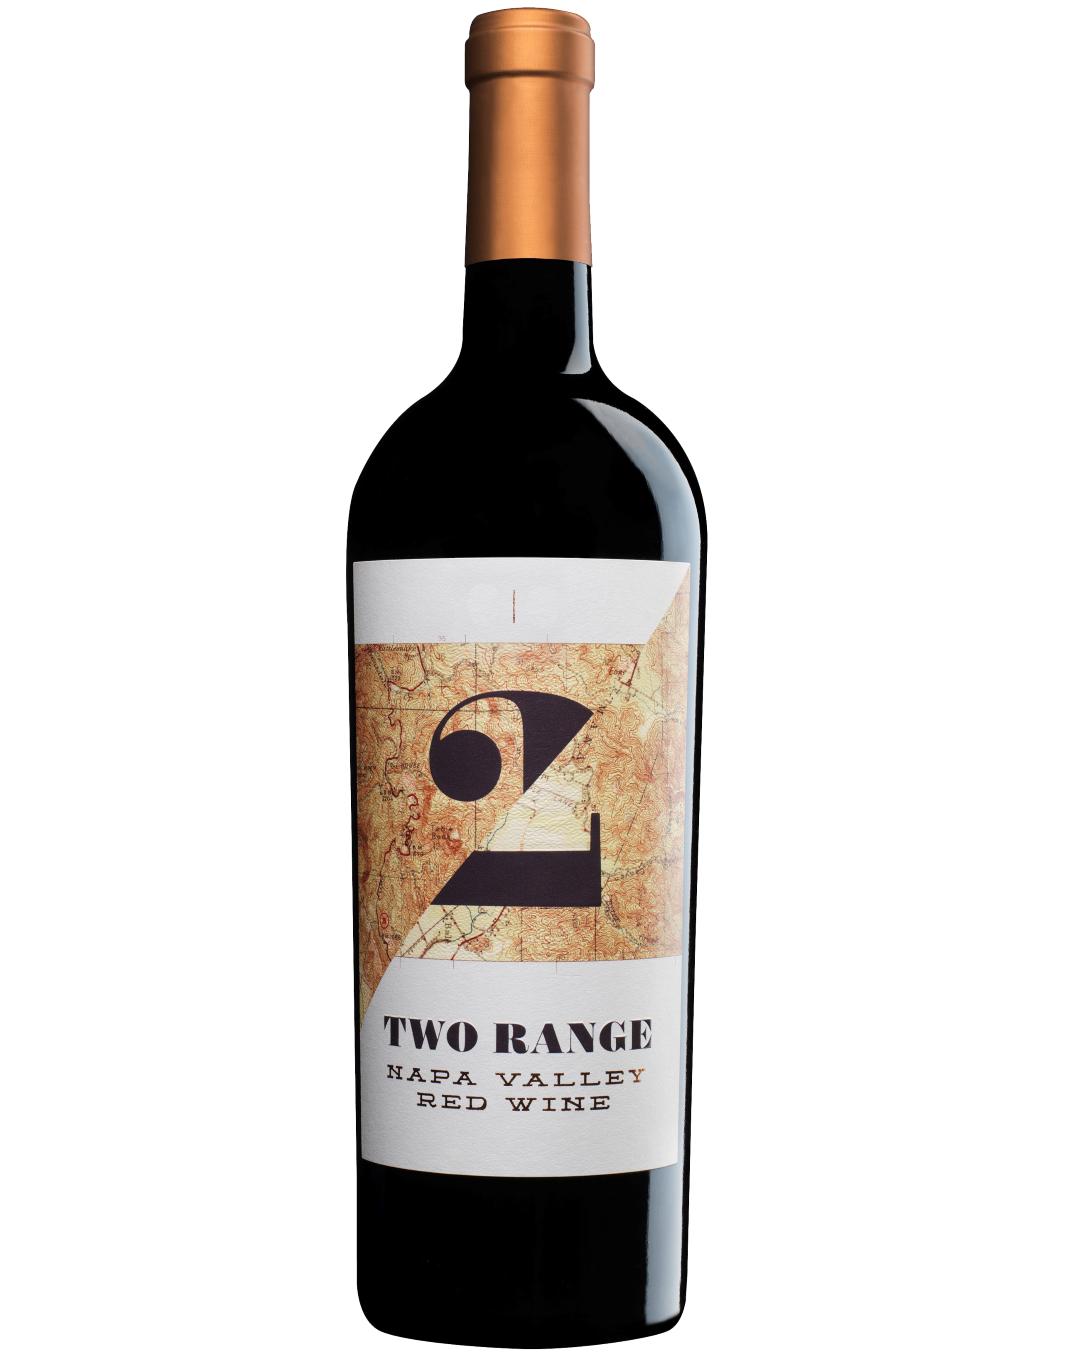 2016 Two Range Red Wine Napa Valley